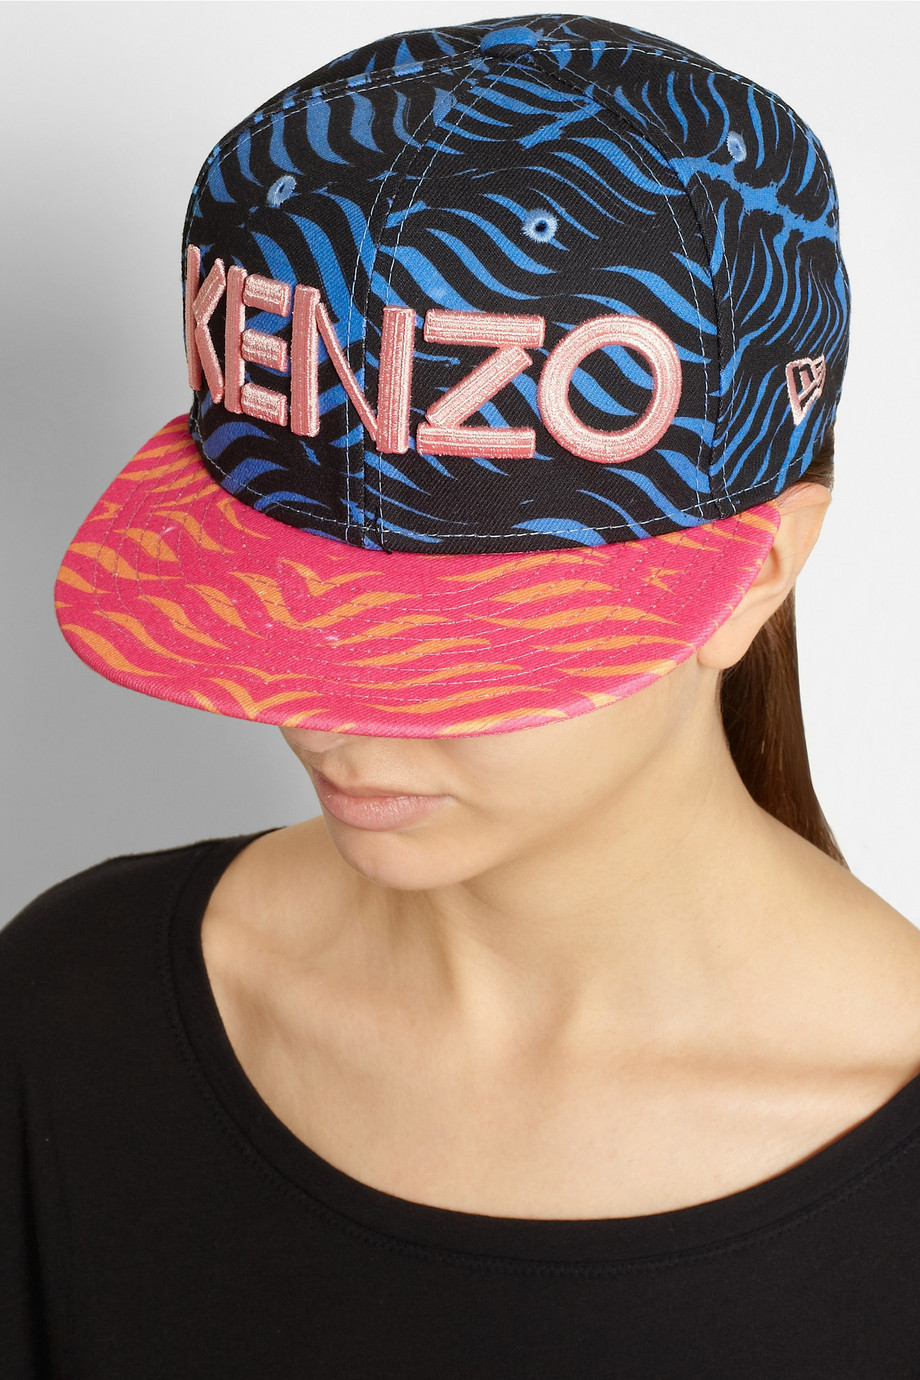 KENZO   New Era printed baseball cap   NET-A